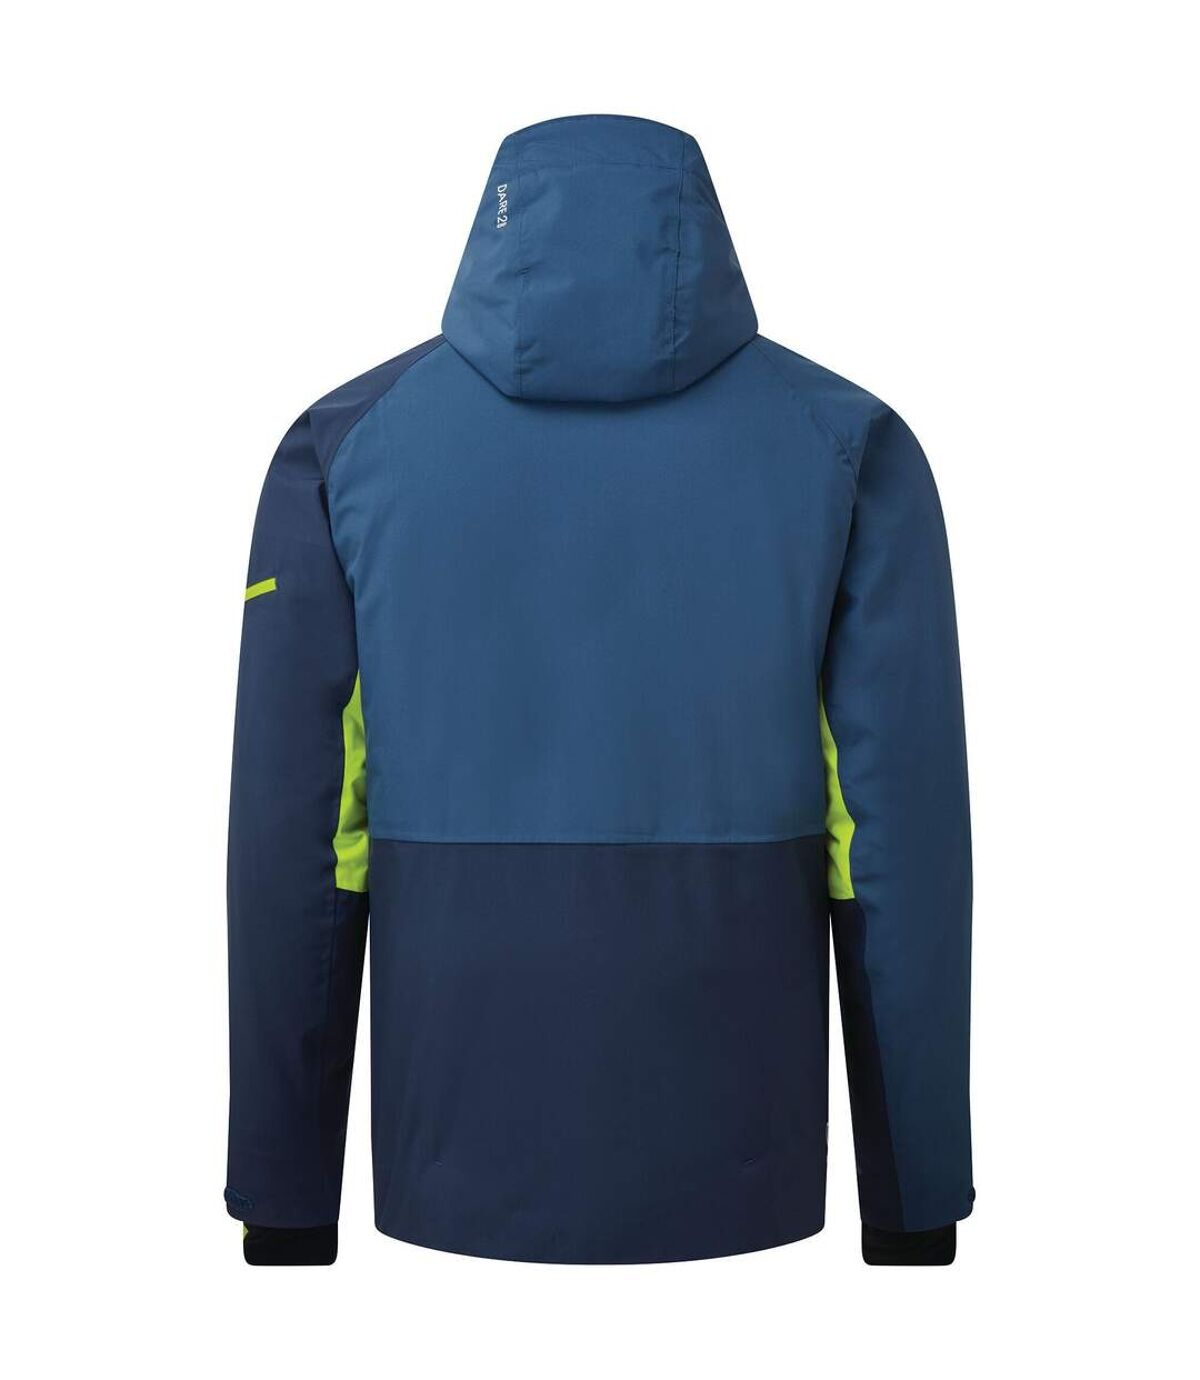 Dare 2B - Blouson de ski - Hommes (Bleu nuit / bleu foncé) - UTRG5320